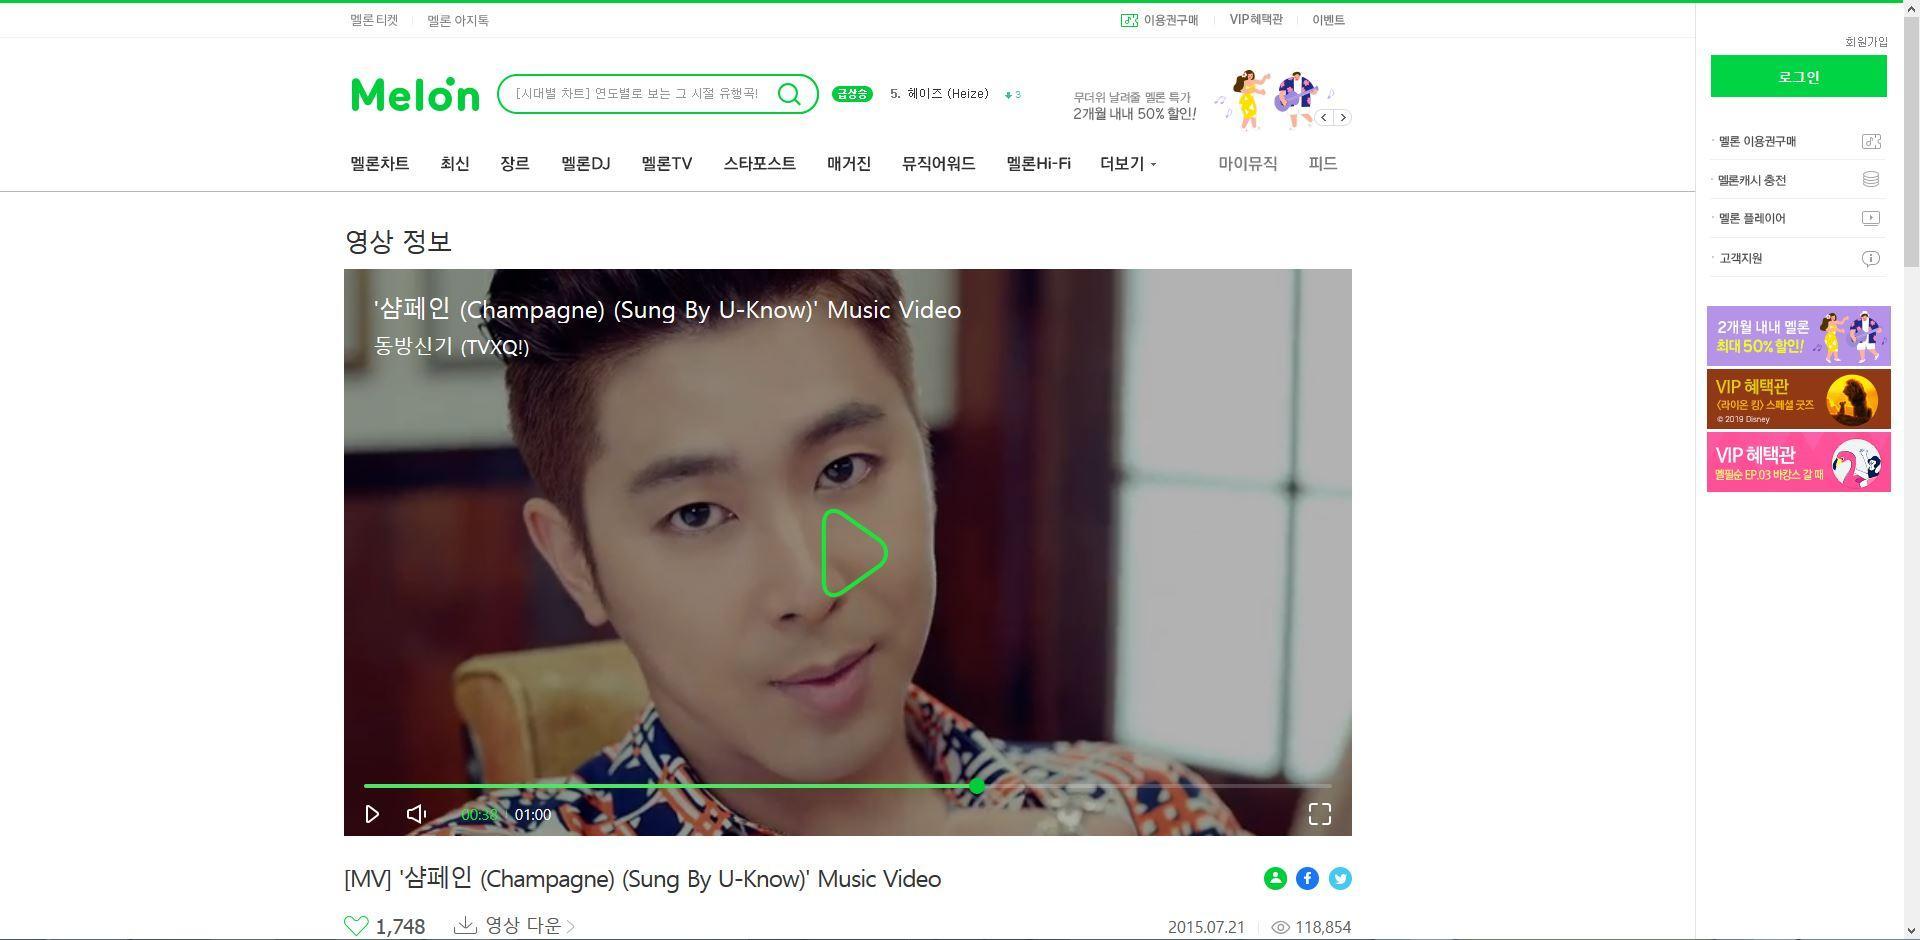 Melon South Korean Music Portal